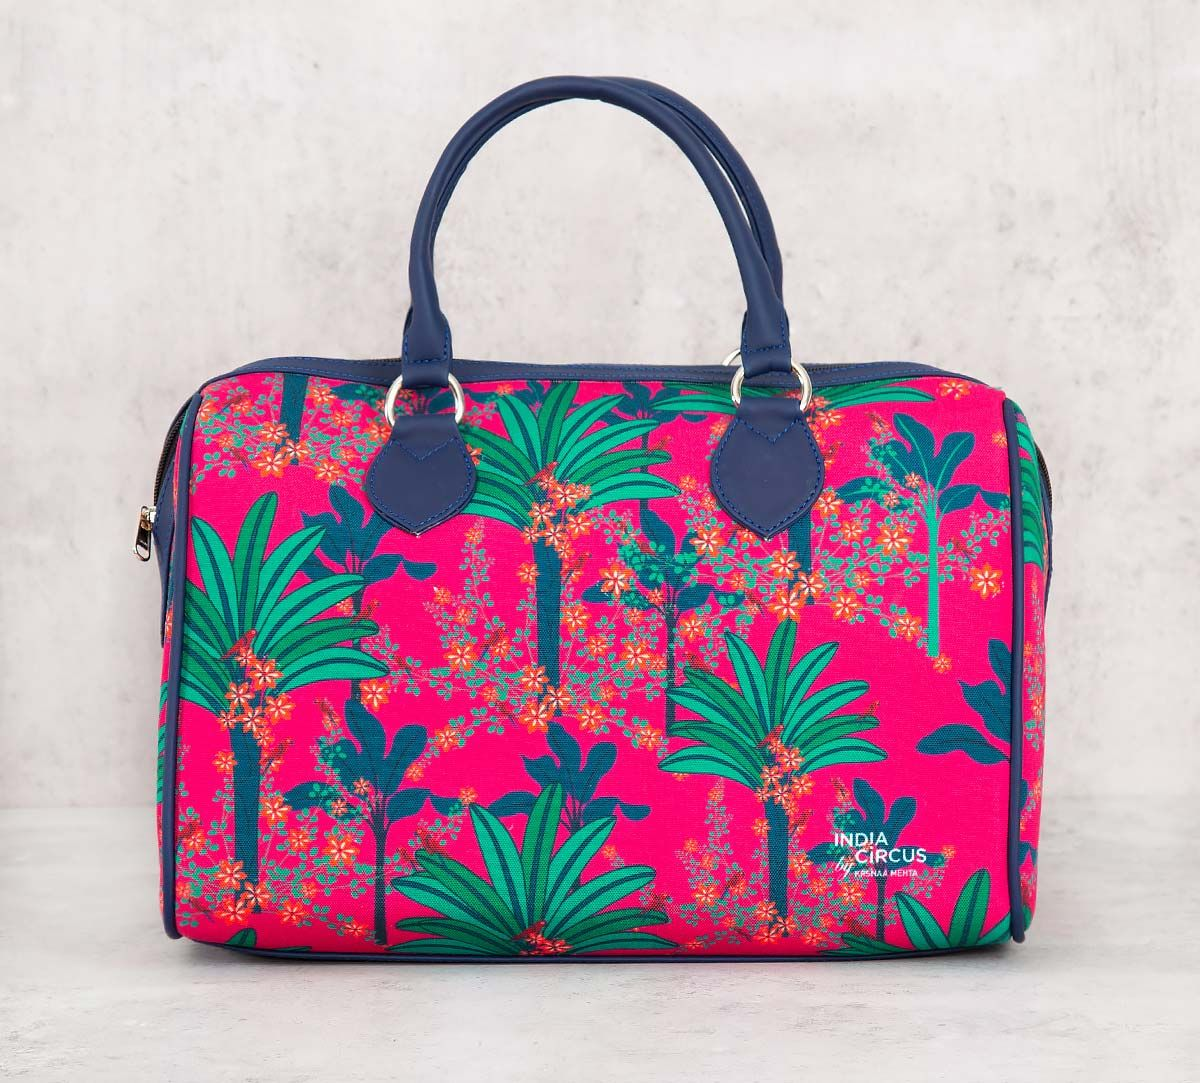 India Circus Royal Palms Duffle Bag